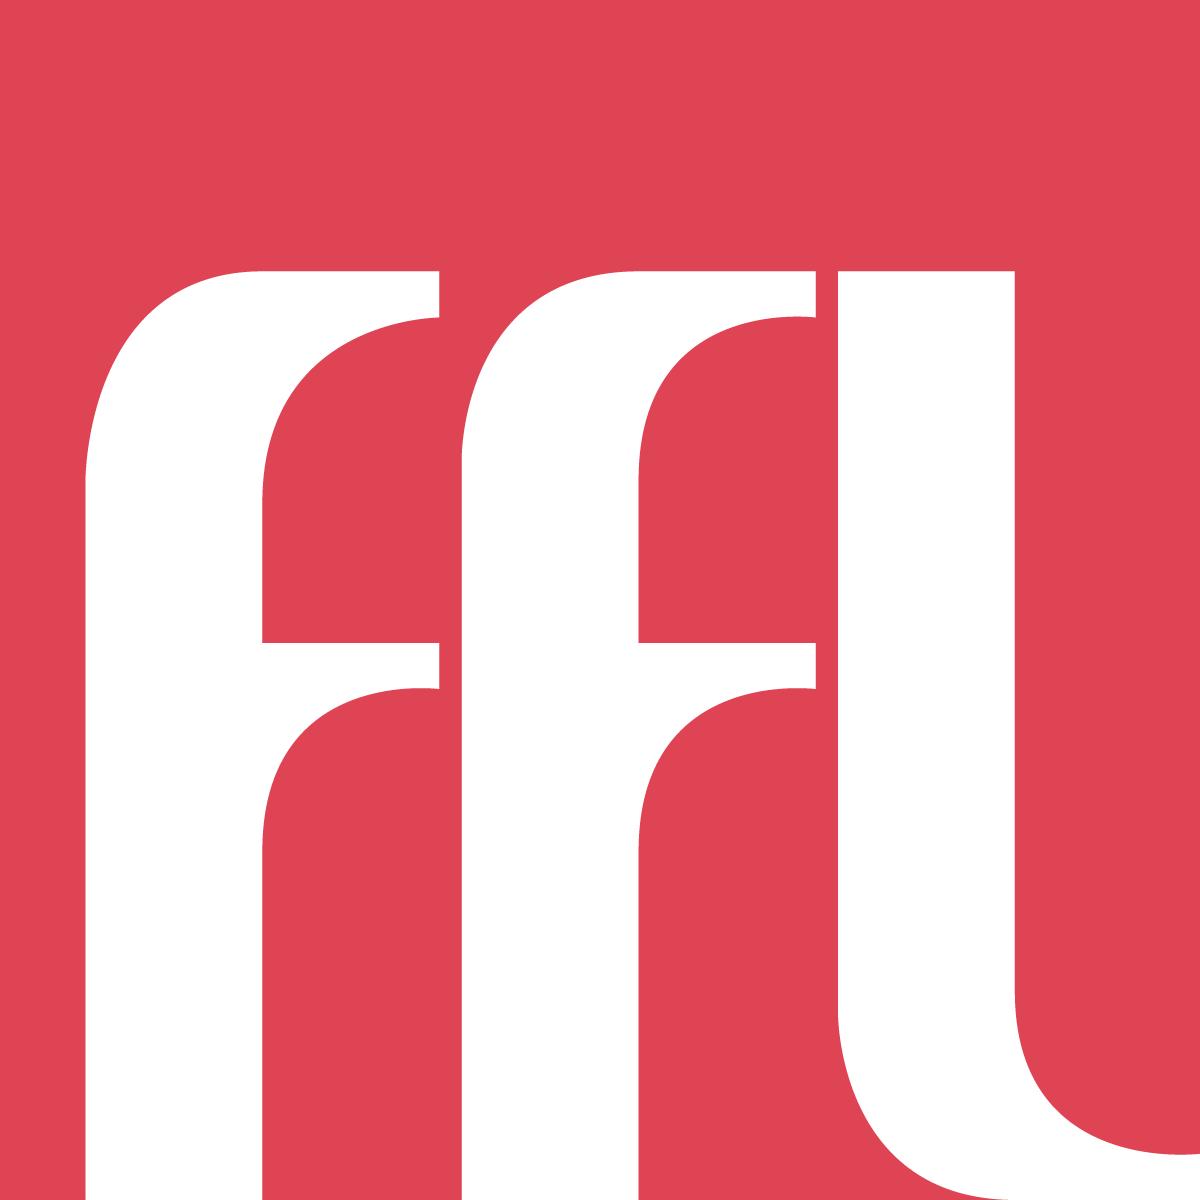 ffl_2020_red